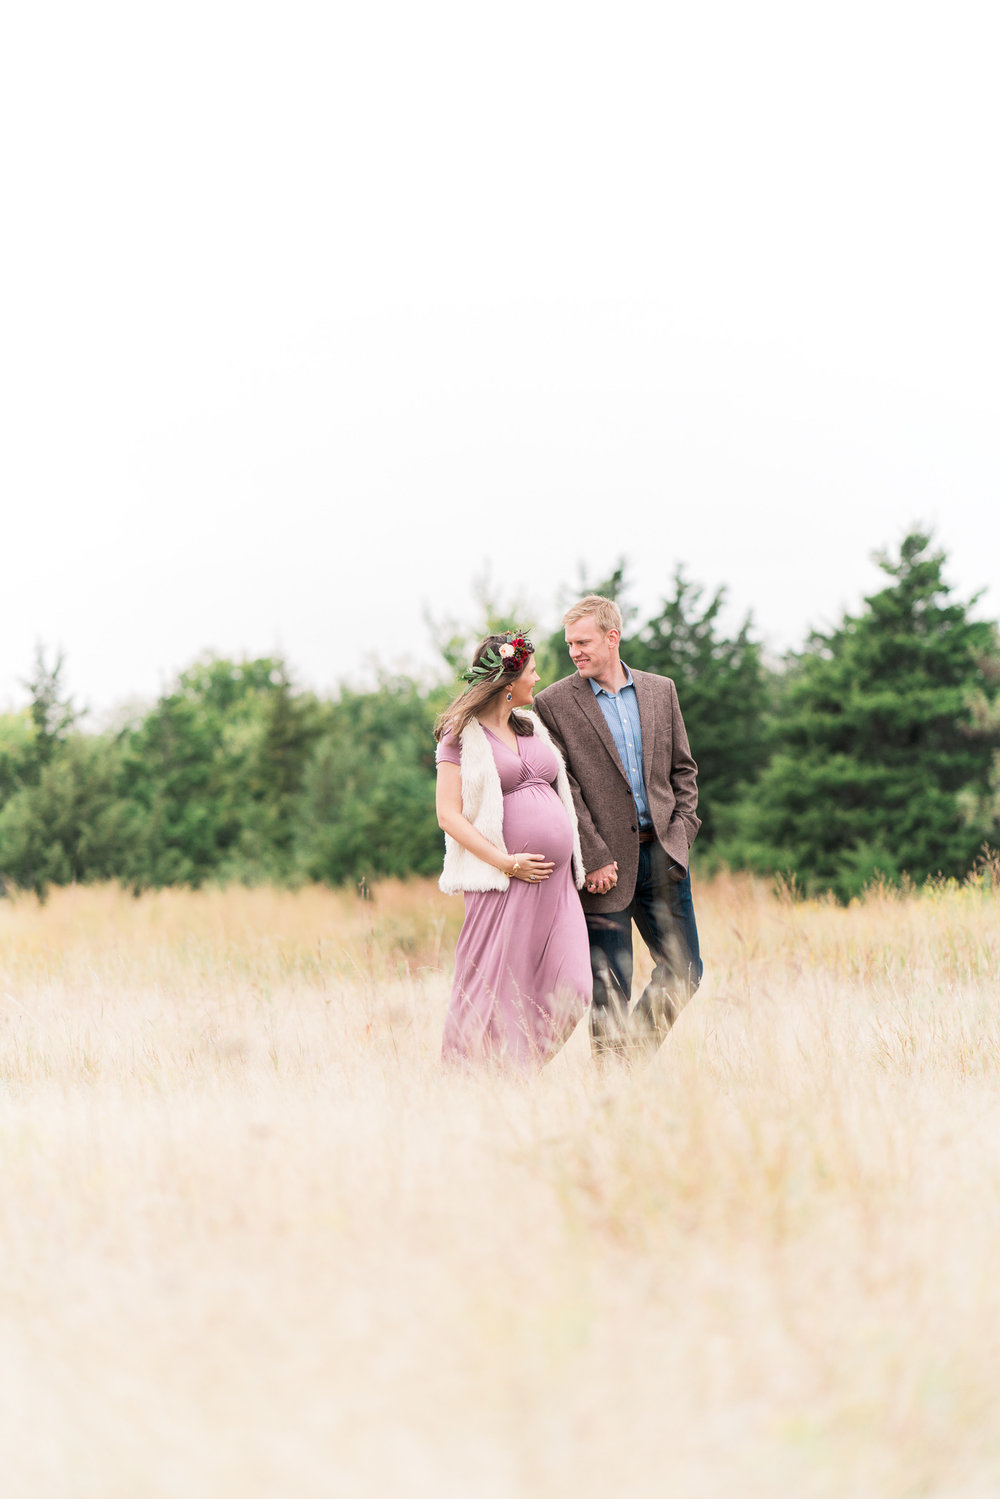 Lizanne-Andrew-Maternity-Kate-Bernard-Photography-Web-37.jpg